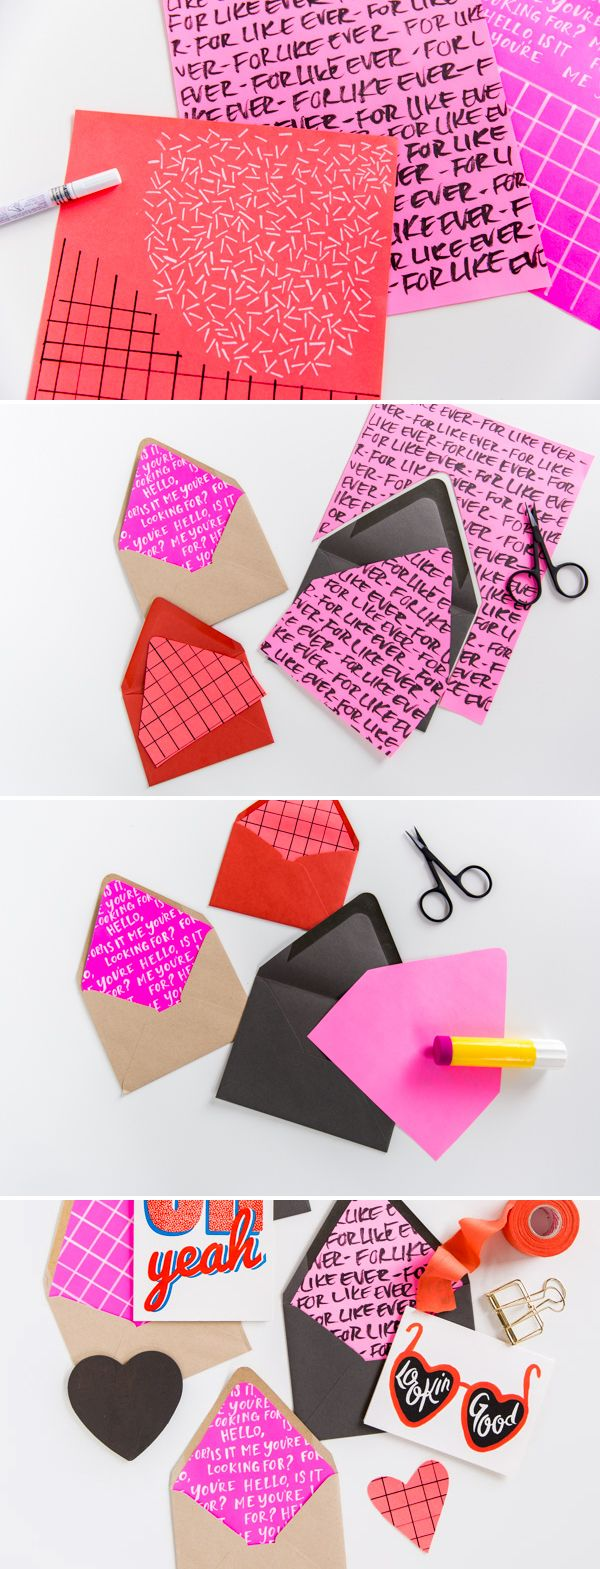 Wedding Invitation Addressing Etiquette One Envelope >> 10 Things ...